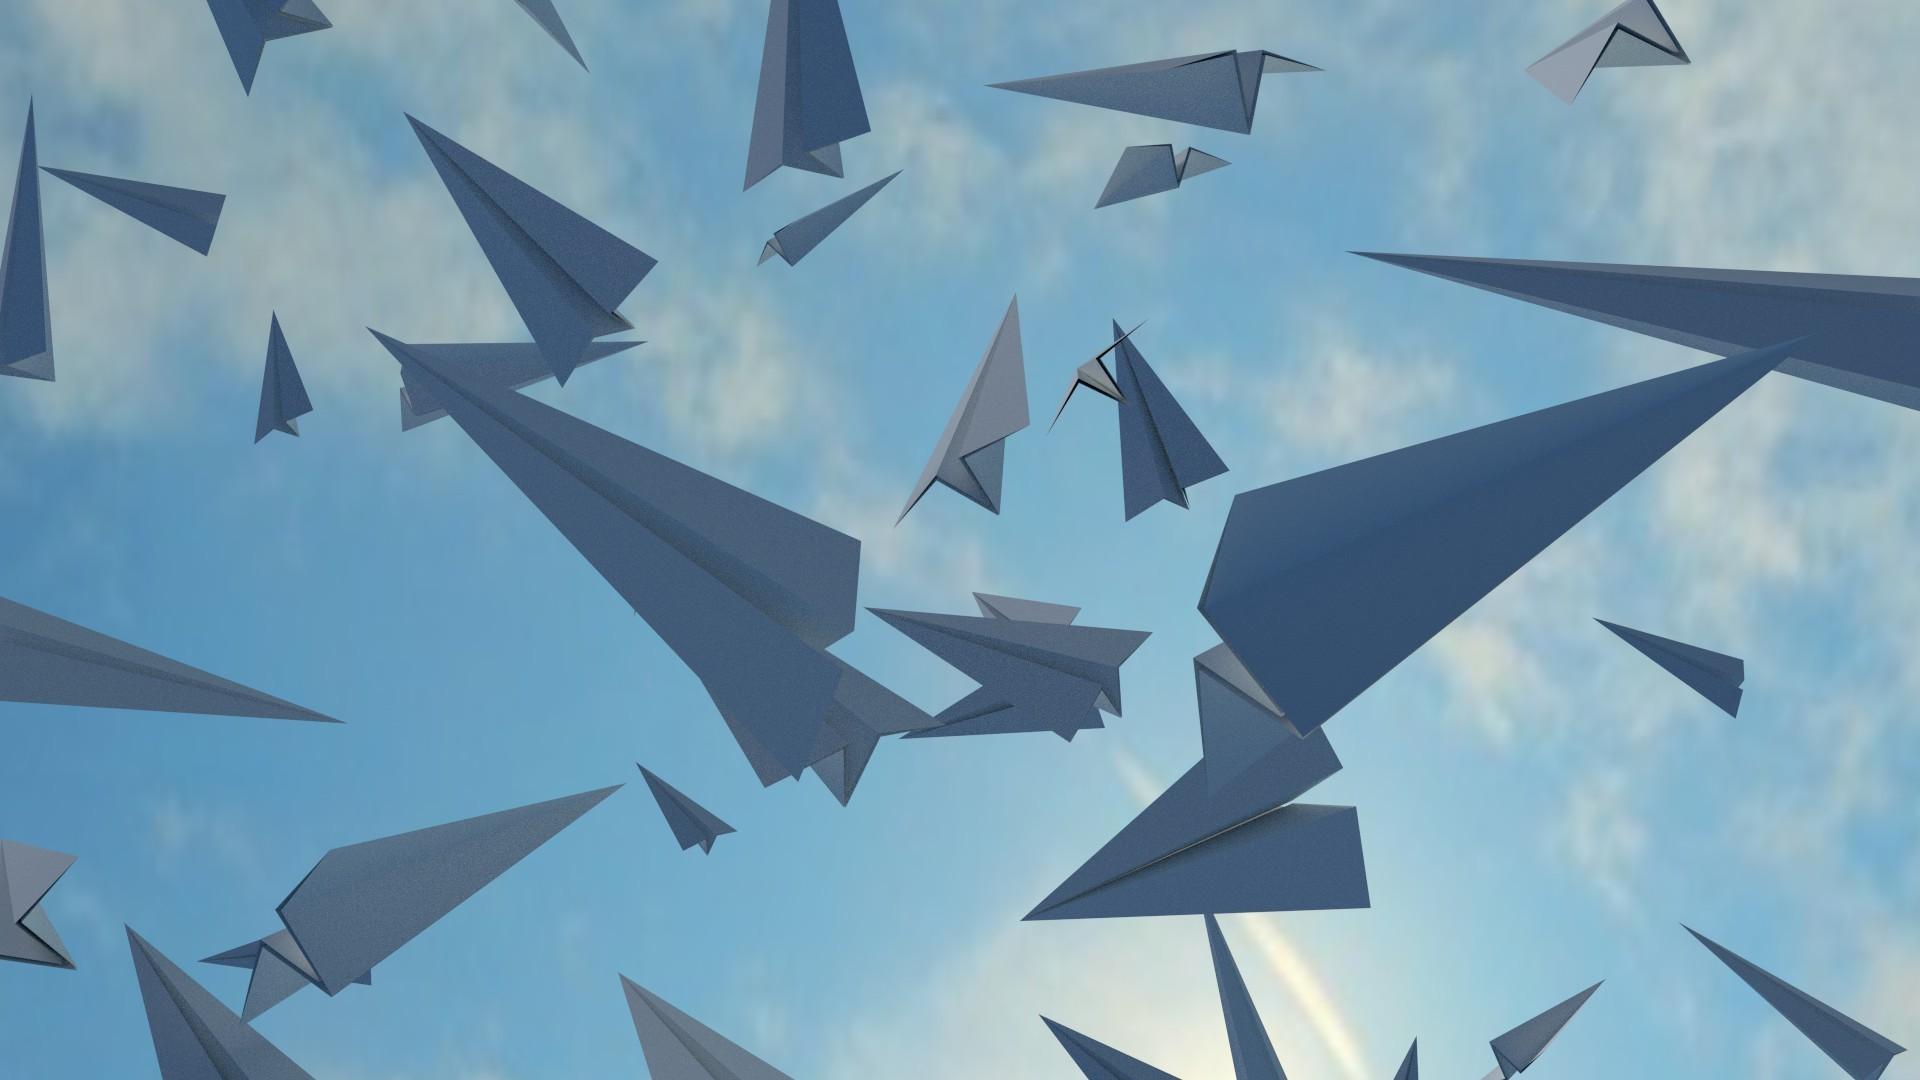 Paper Airplane wallpaper hd